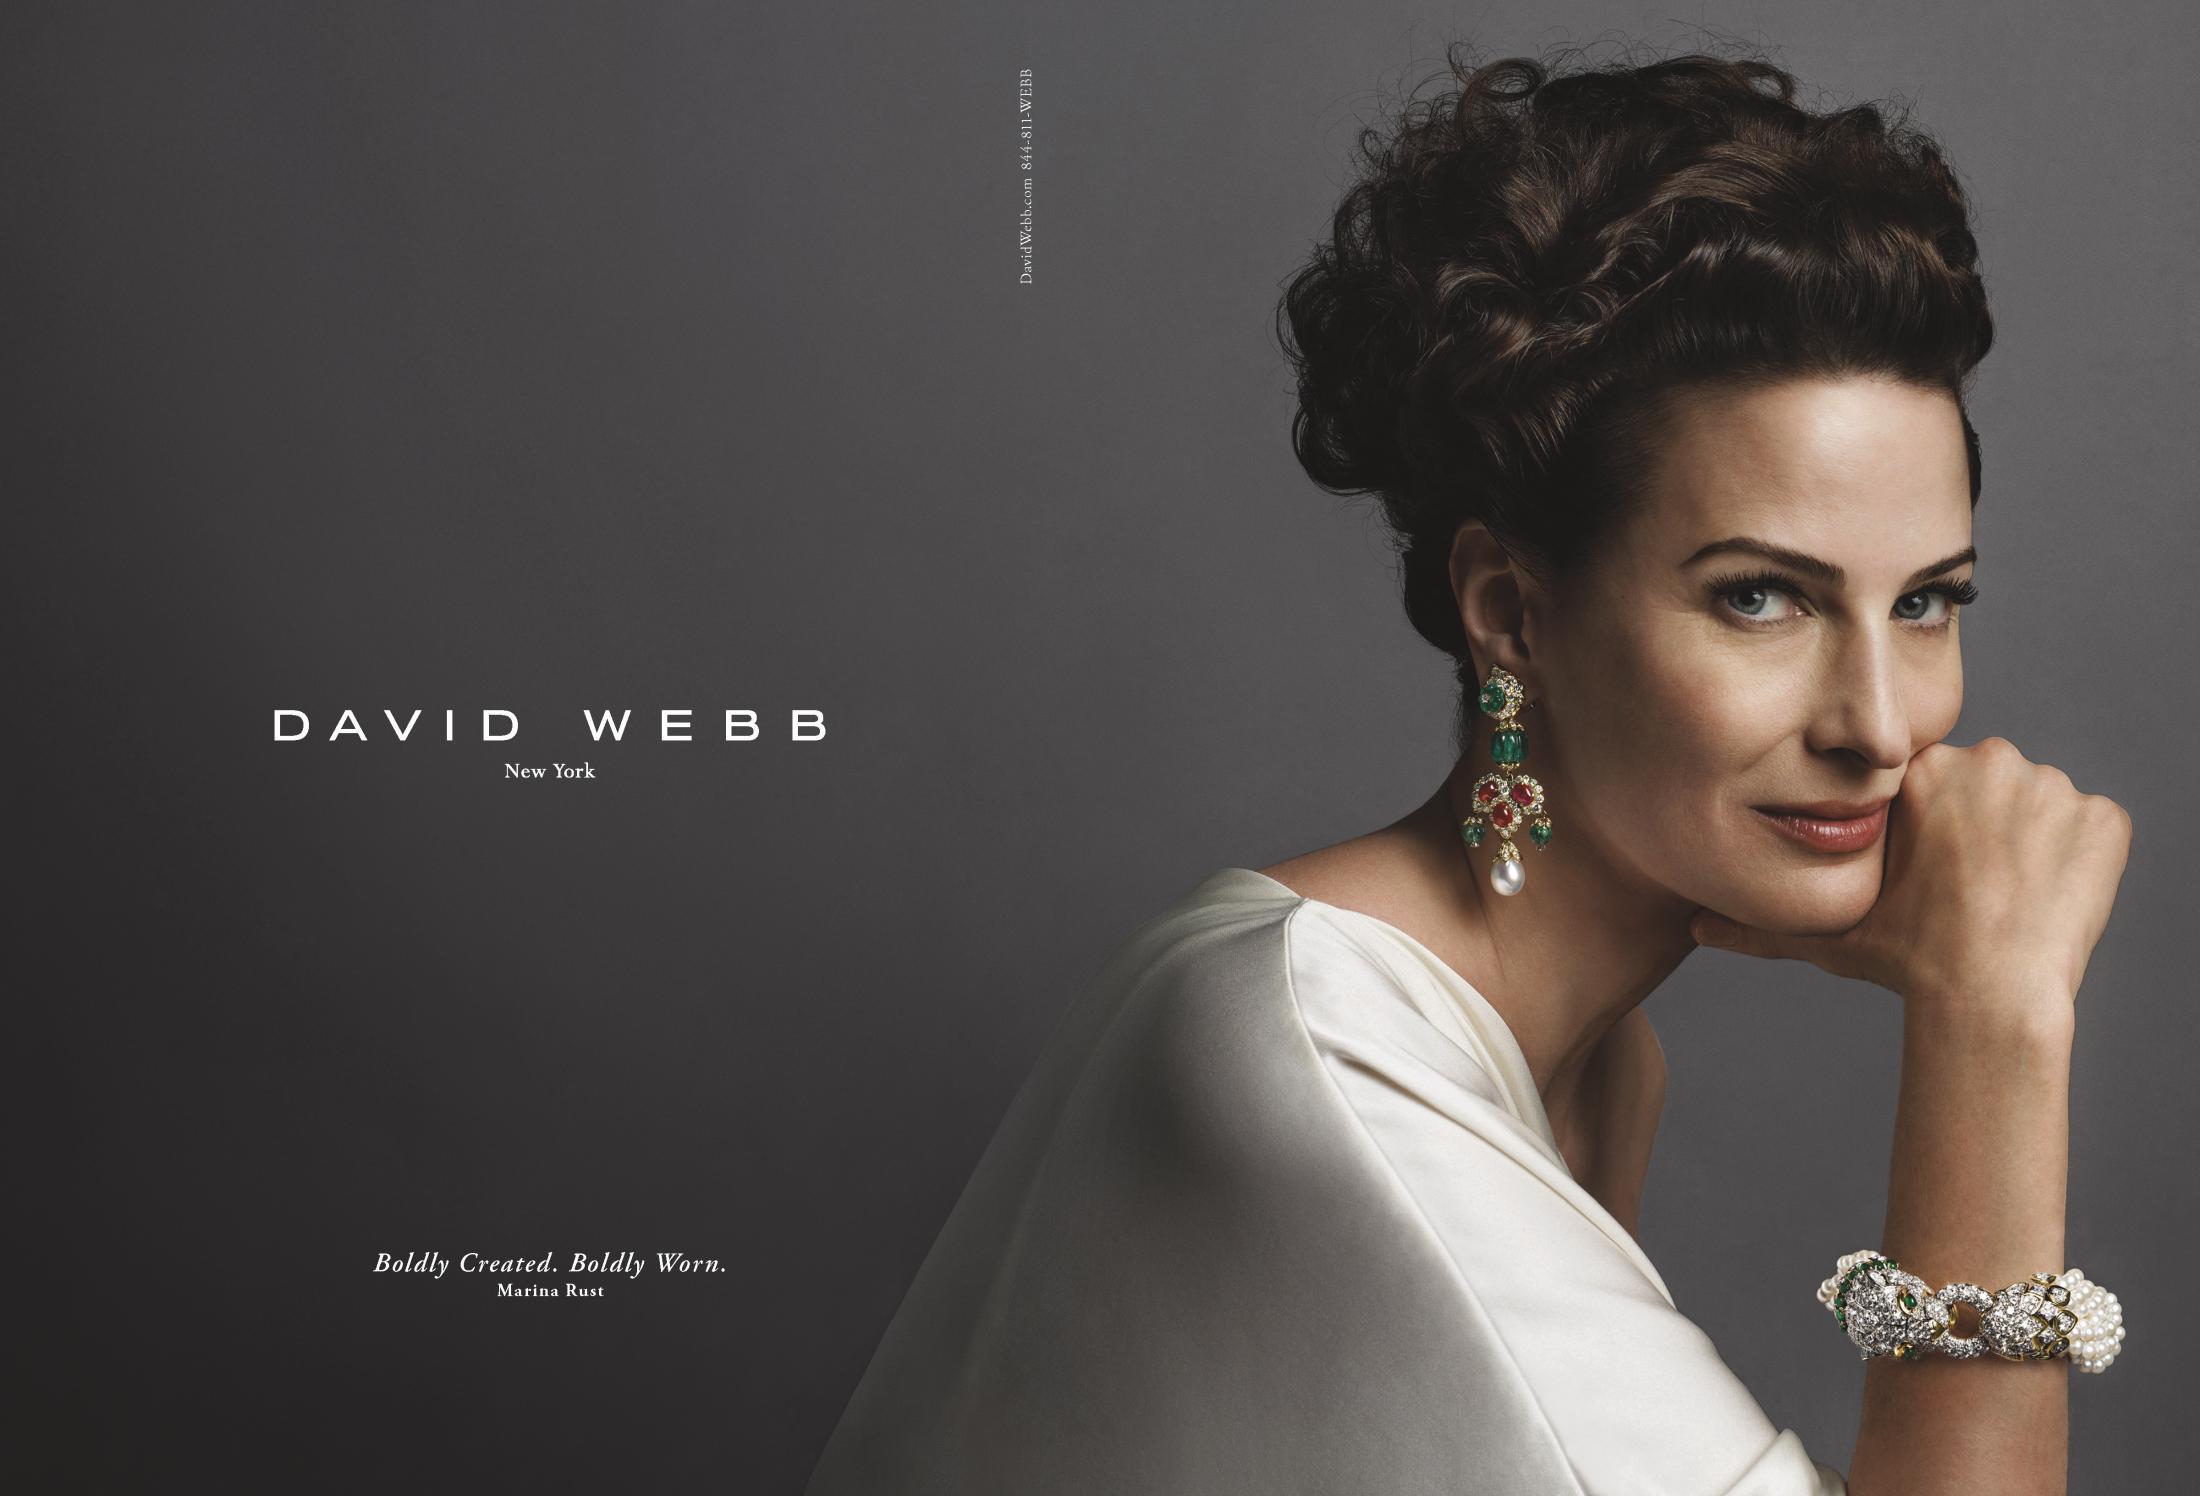 Thumbnail for David Webb